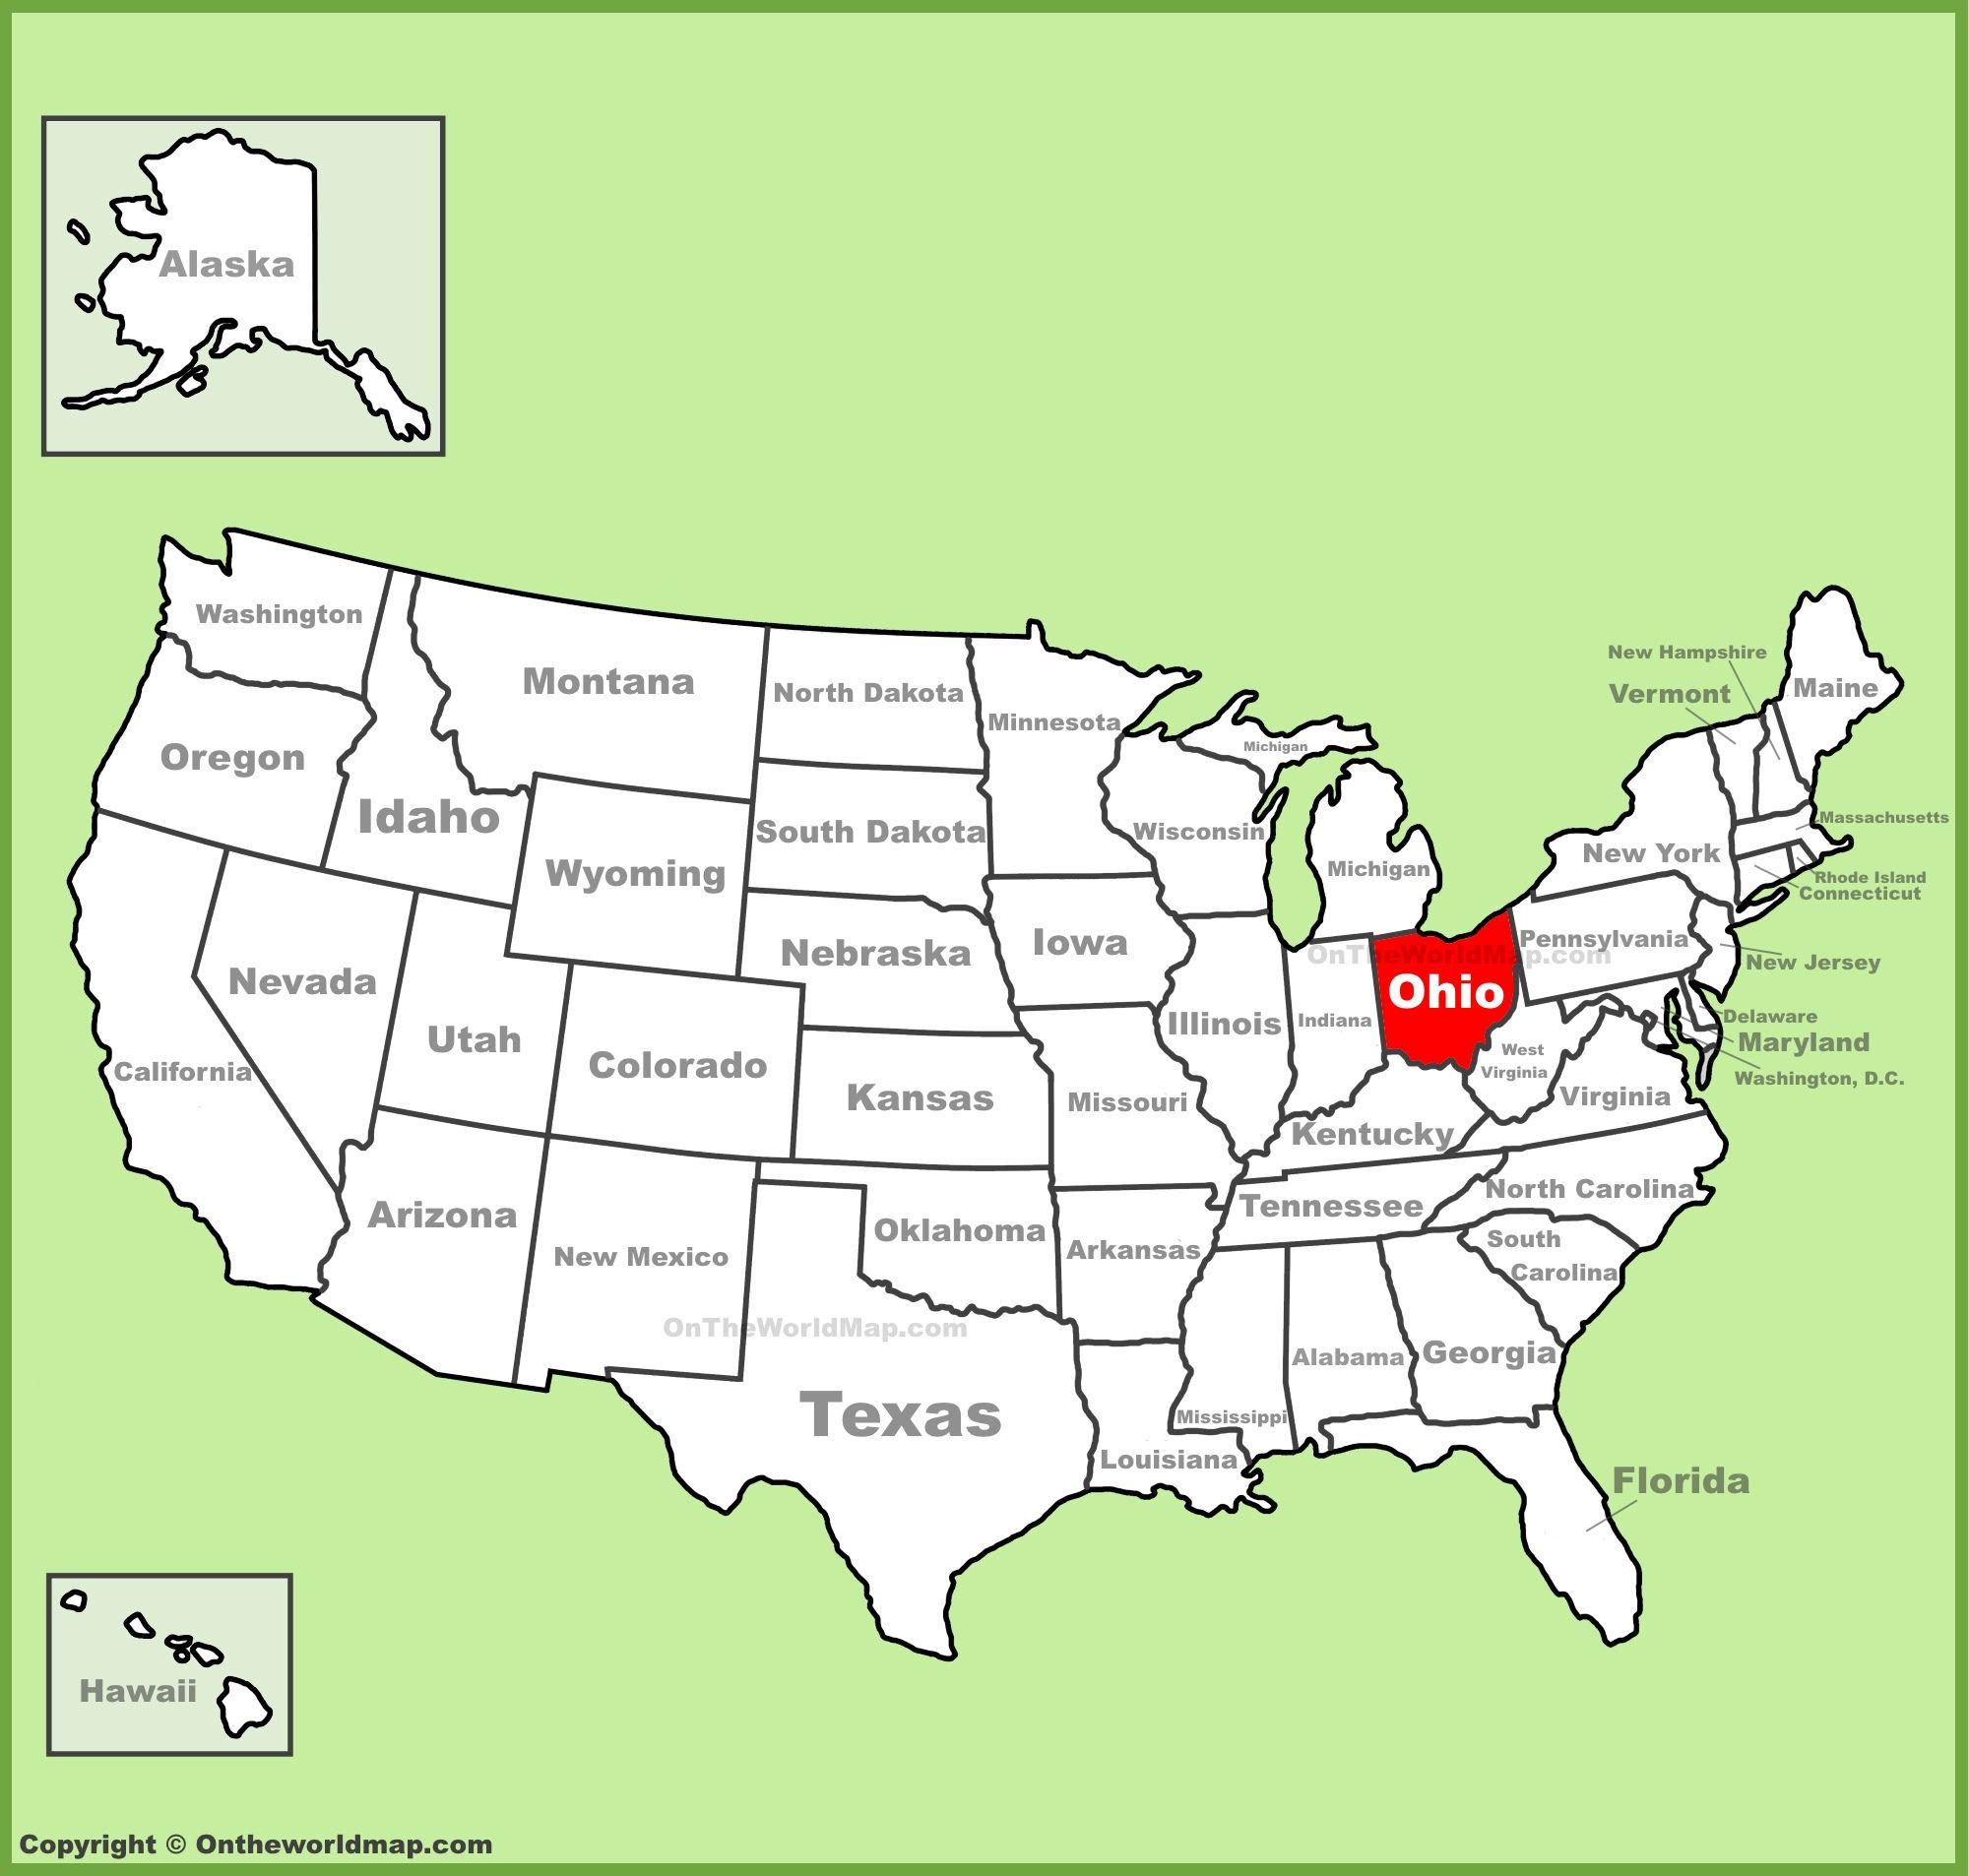 Ohio location on the US Map Ohio Pinterest Ohio